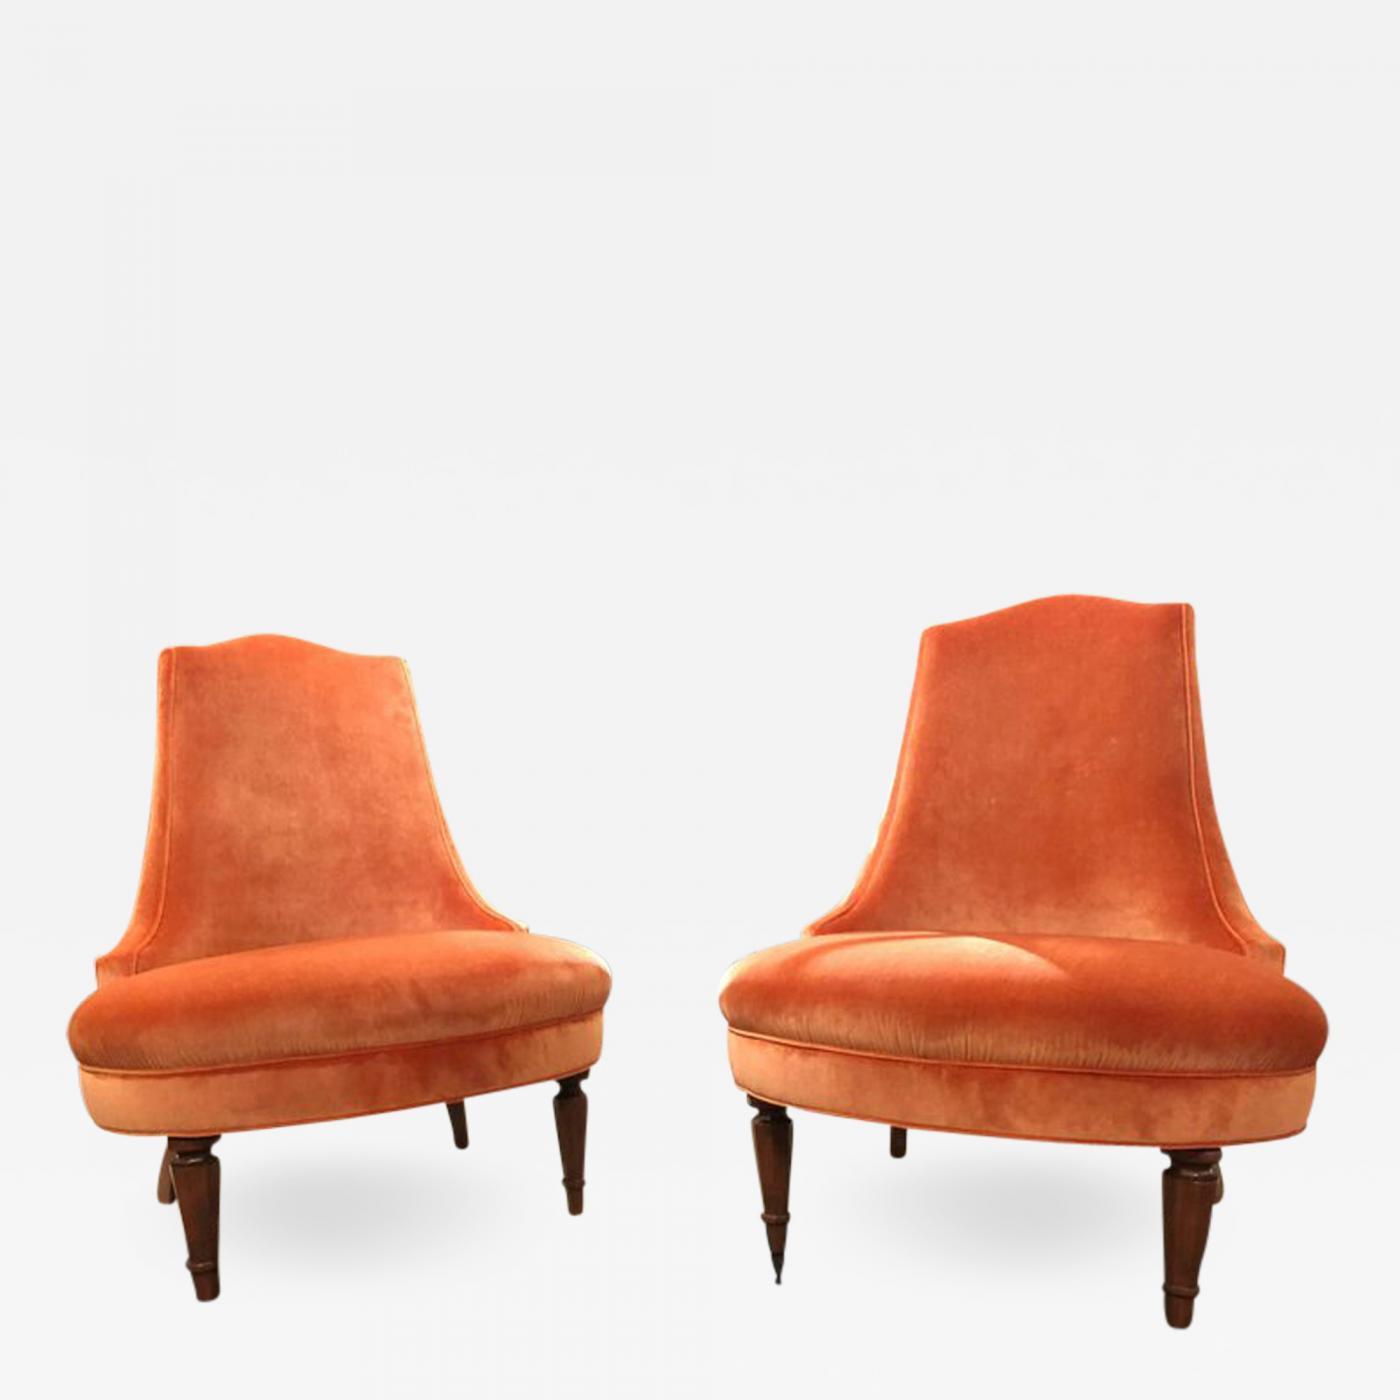 Listings / Furniture / Seating / Lounge Chairs · Pair Of Regency Orange  Velvet Slipper Chairs